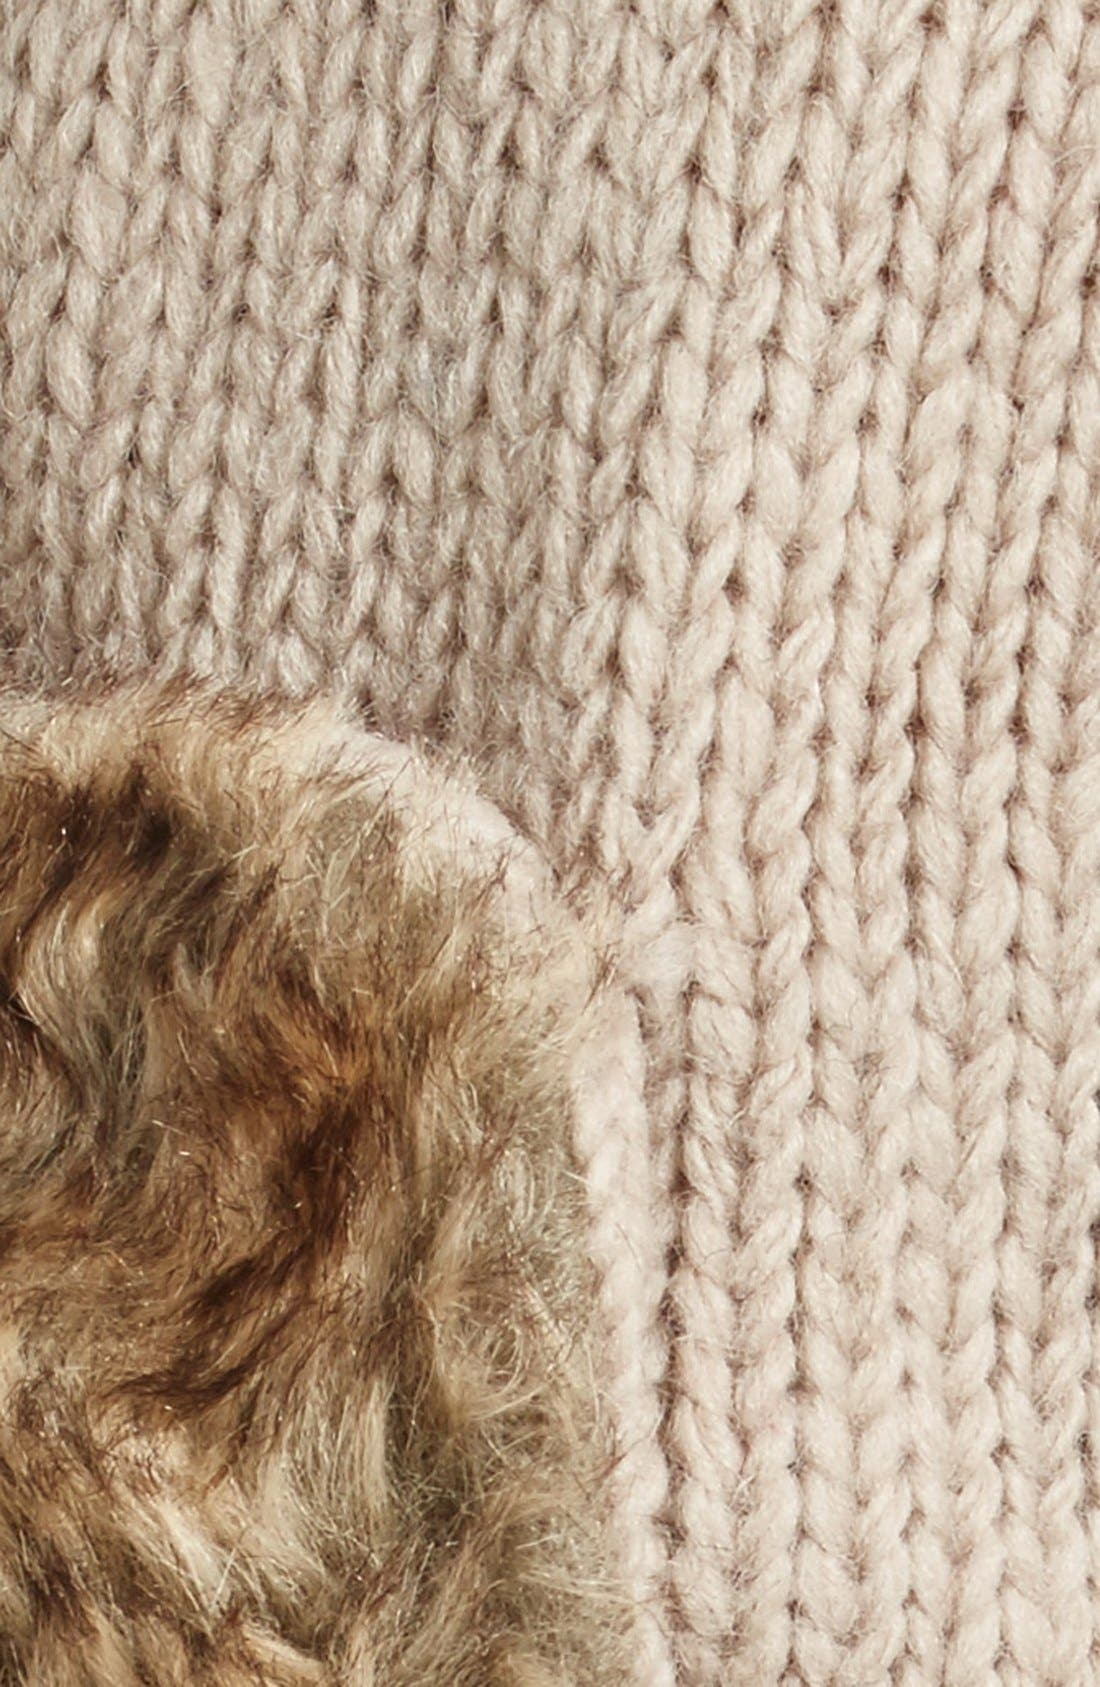 Earflap Hat with Faux Fur Trim,                             Alternate thumbnail 2, color,                             Oatmeal